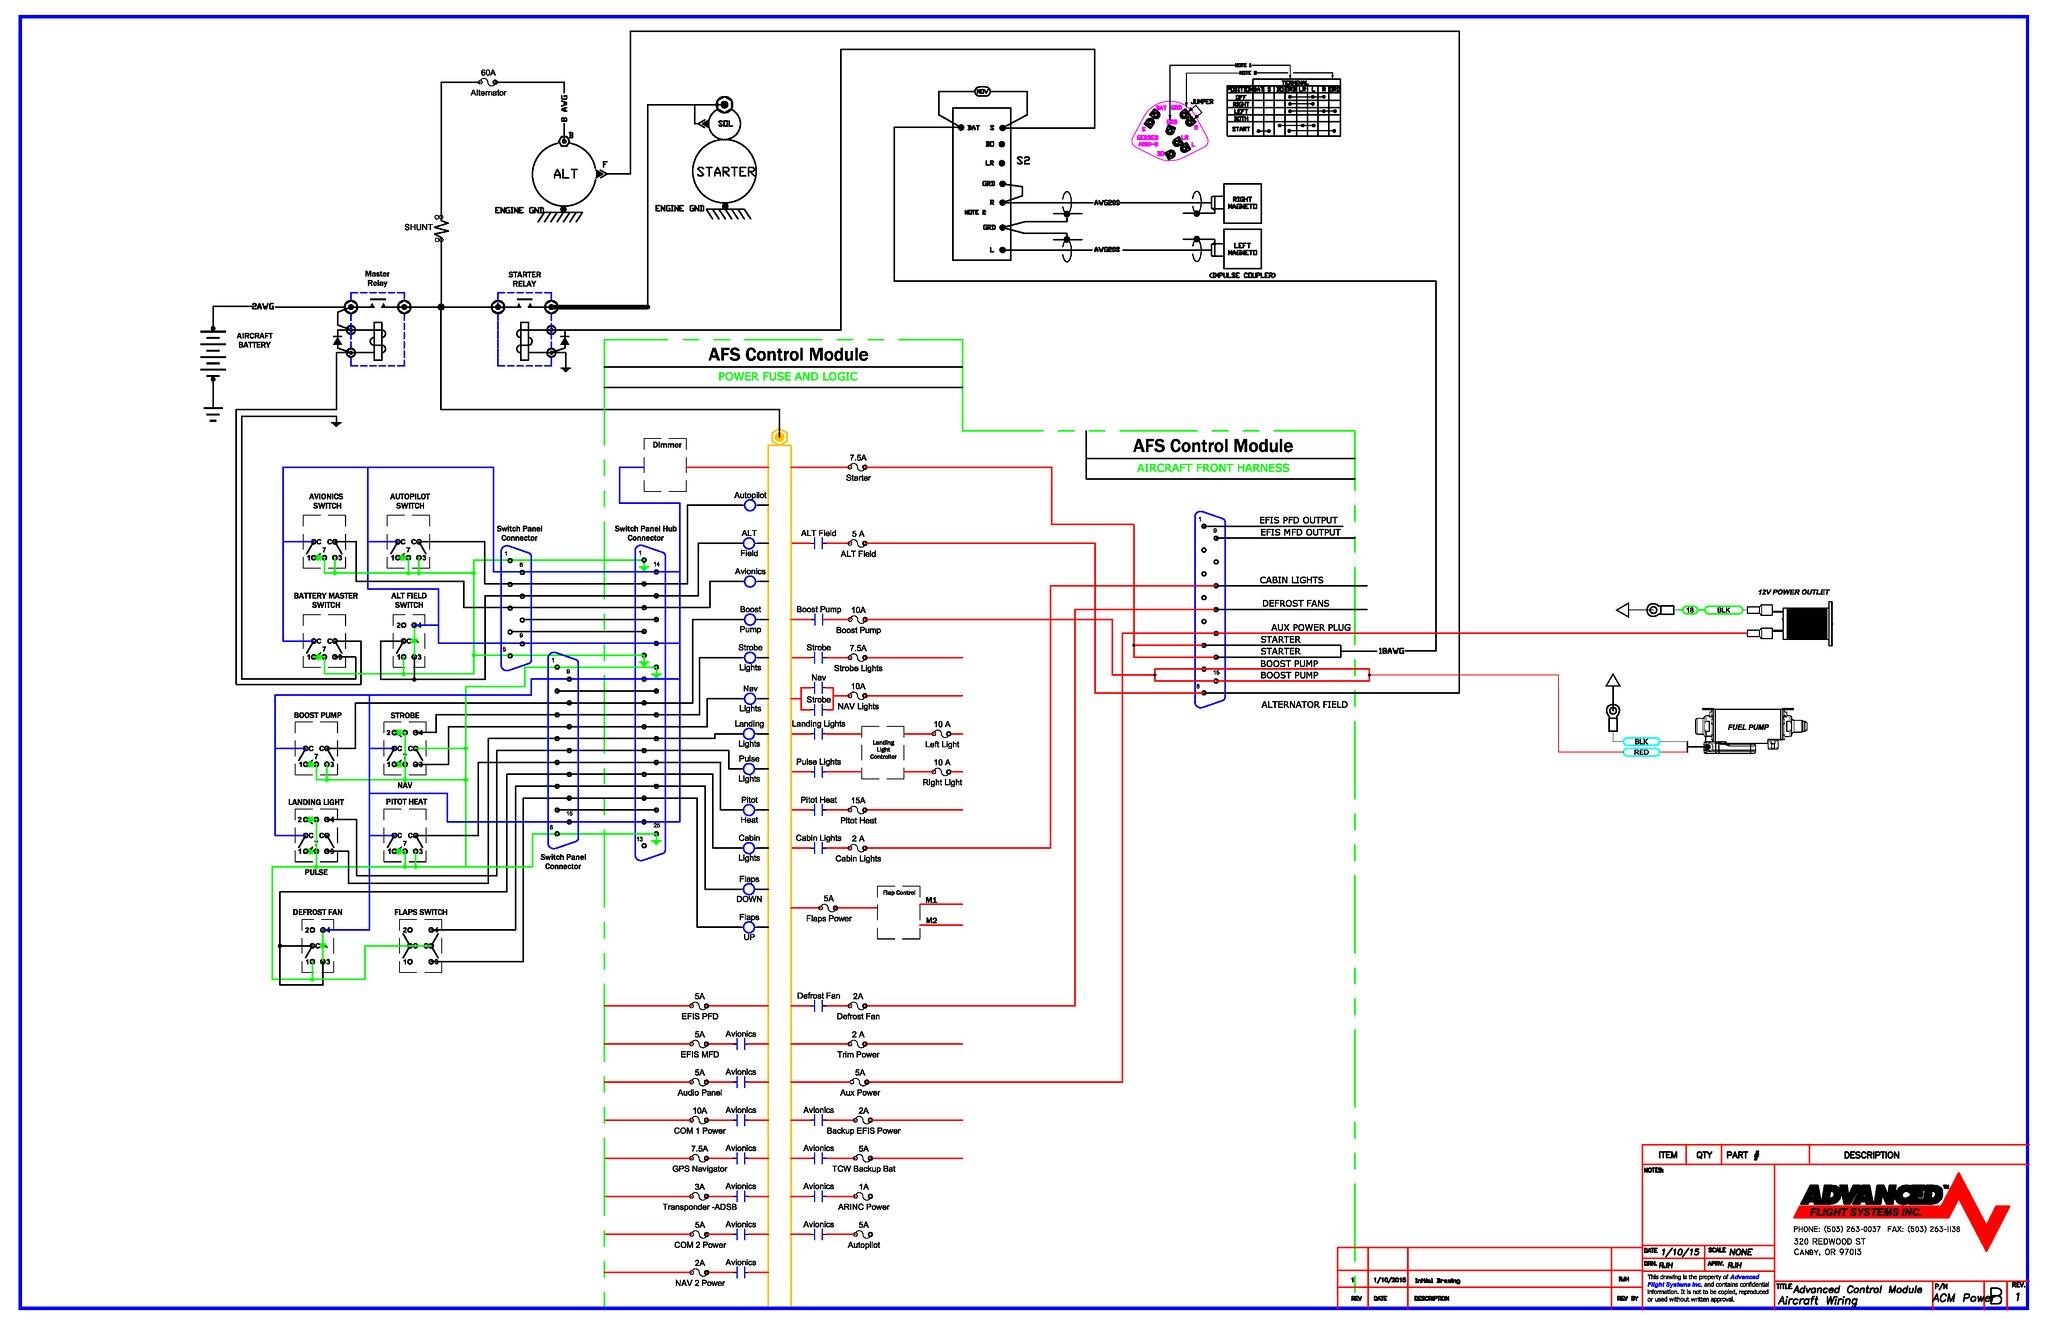 prestolite aircraft alternator wiring diagram 2006 vw passat turbo engine plane power 37